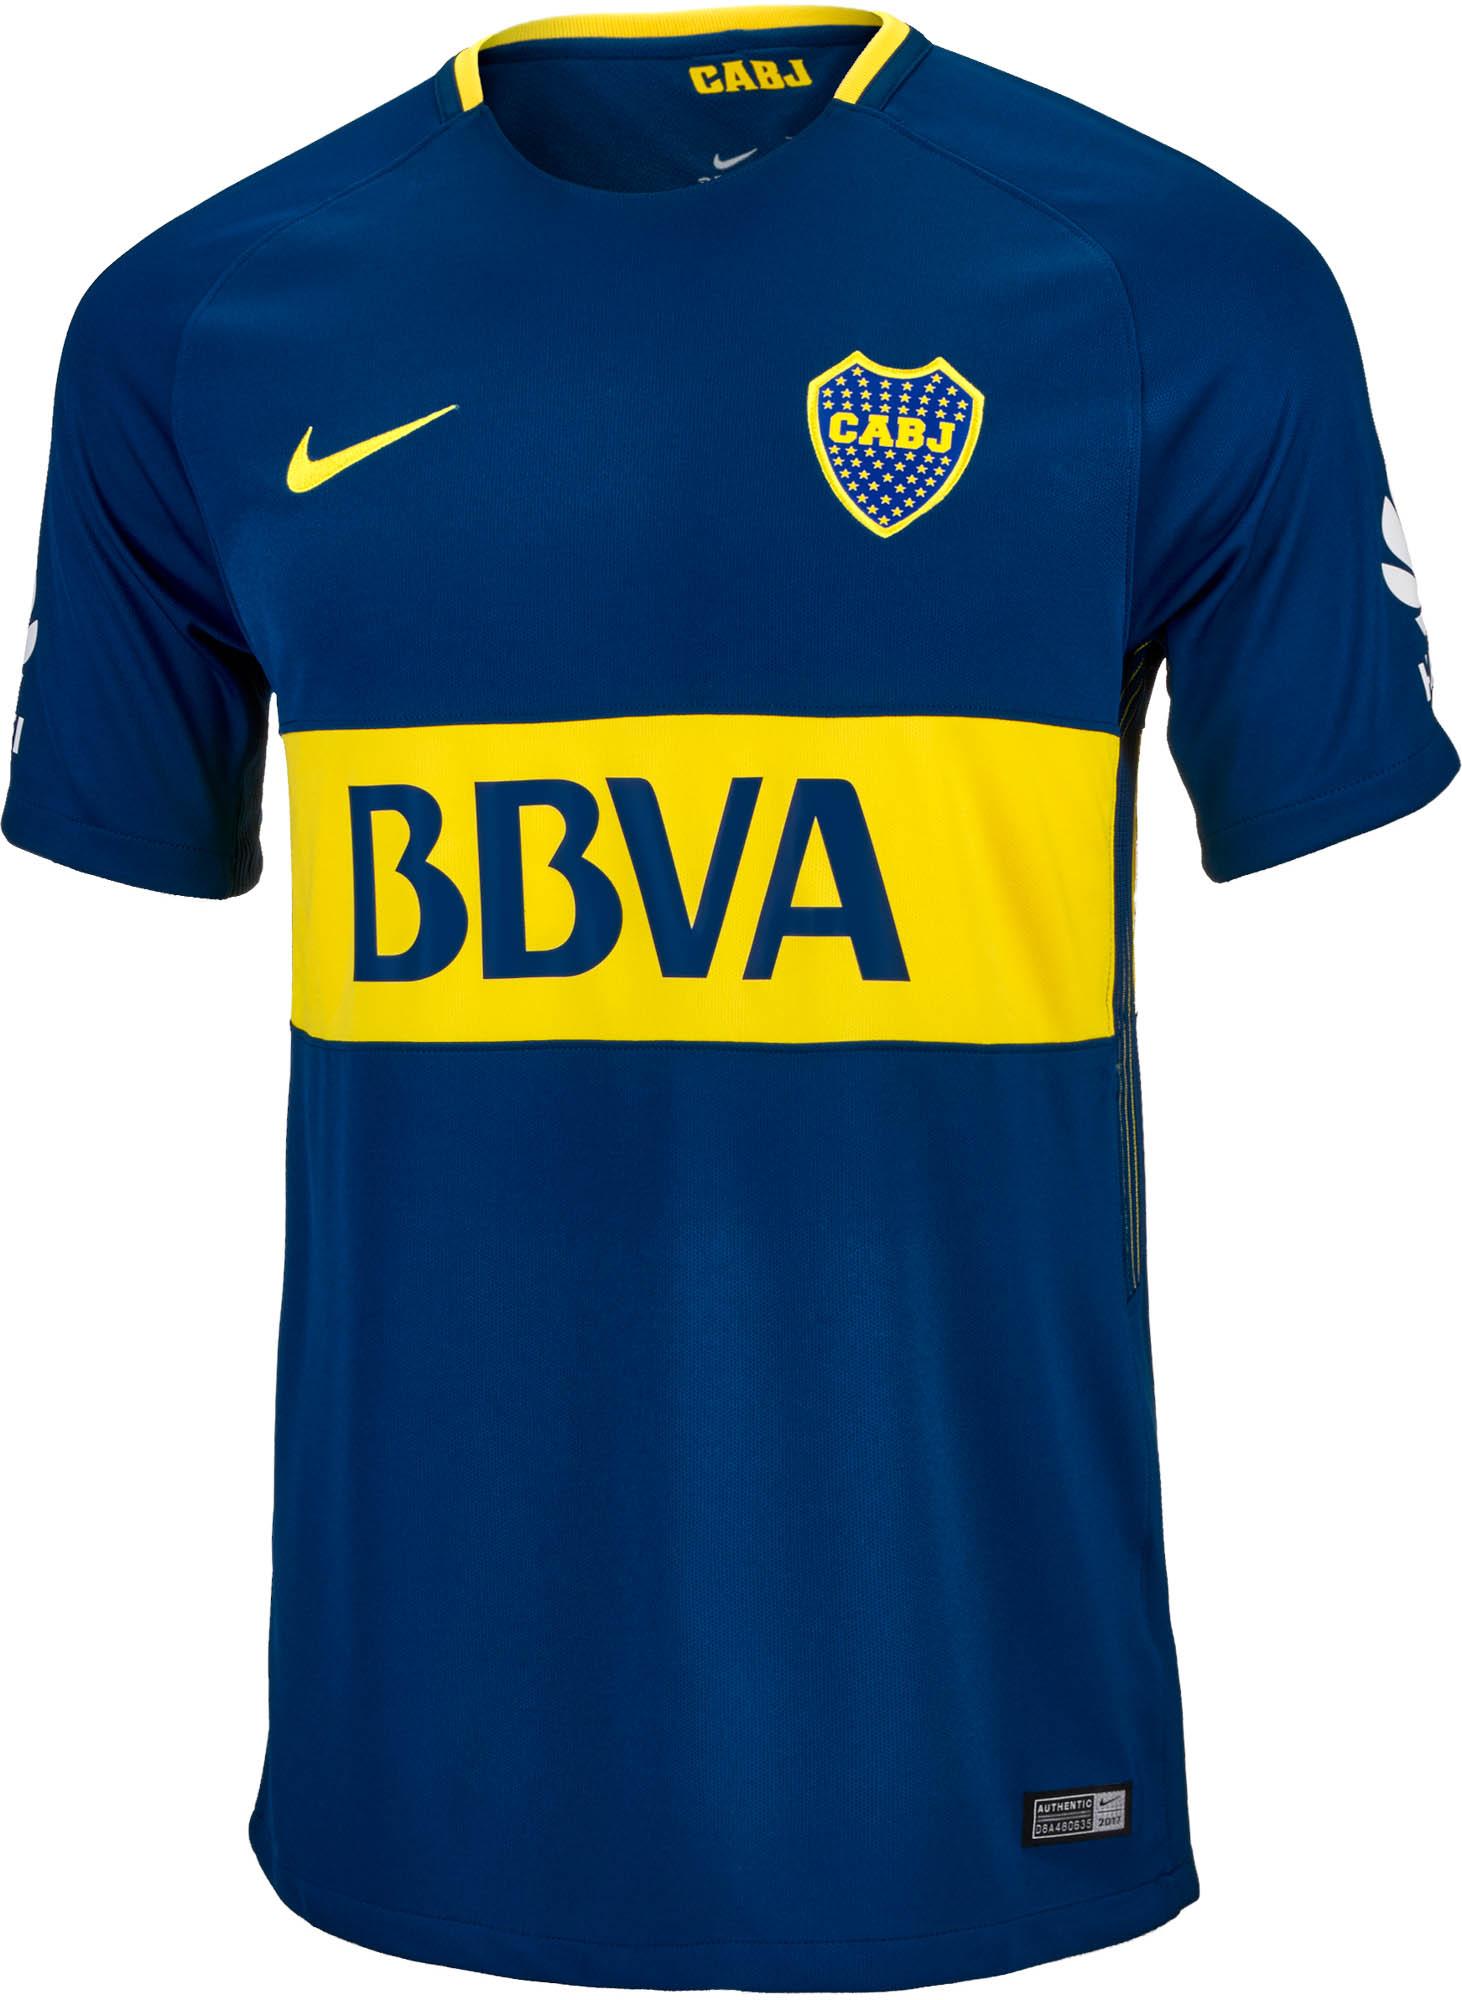 Nike Boca Juniors Home Jersey 17 18 Boca Juniors Gear